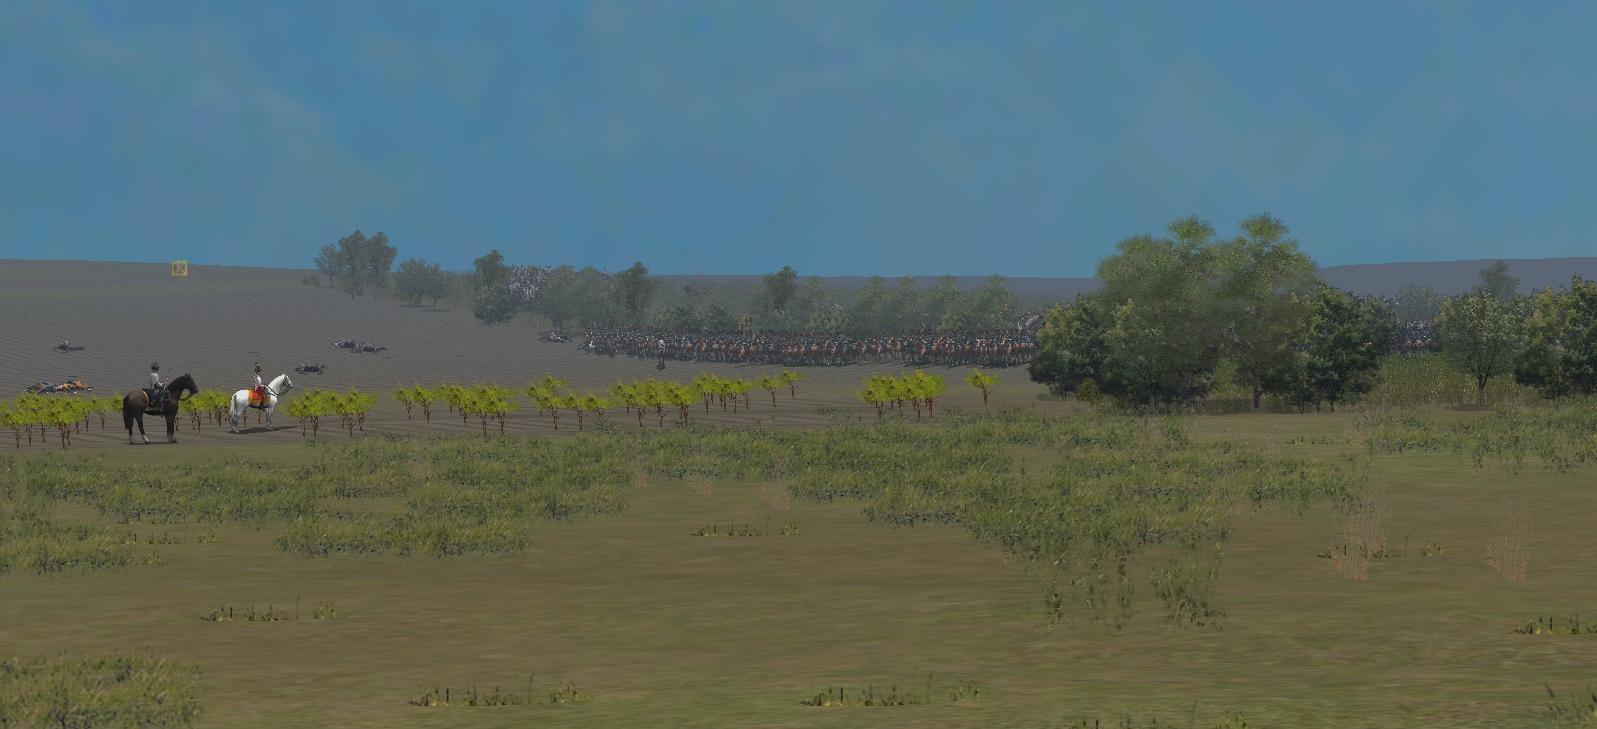 1805 Campaign on the Danube Screen0021